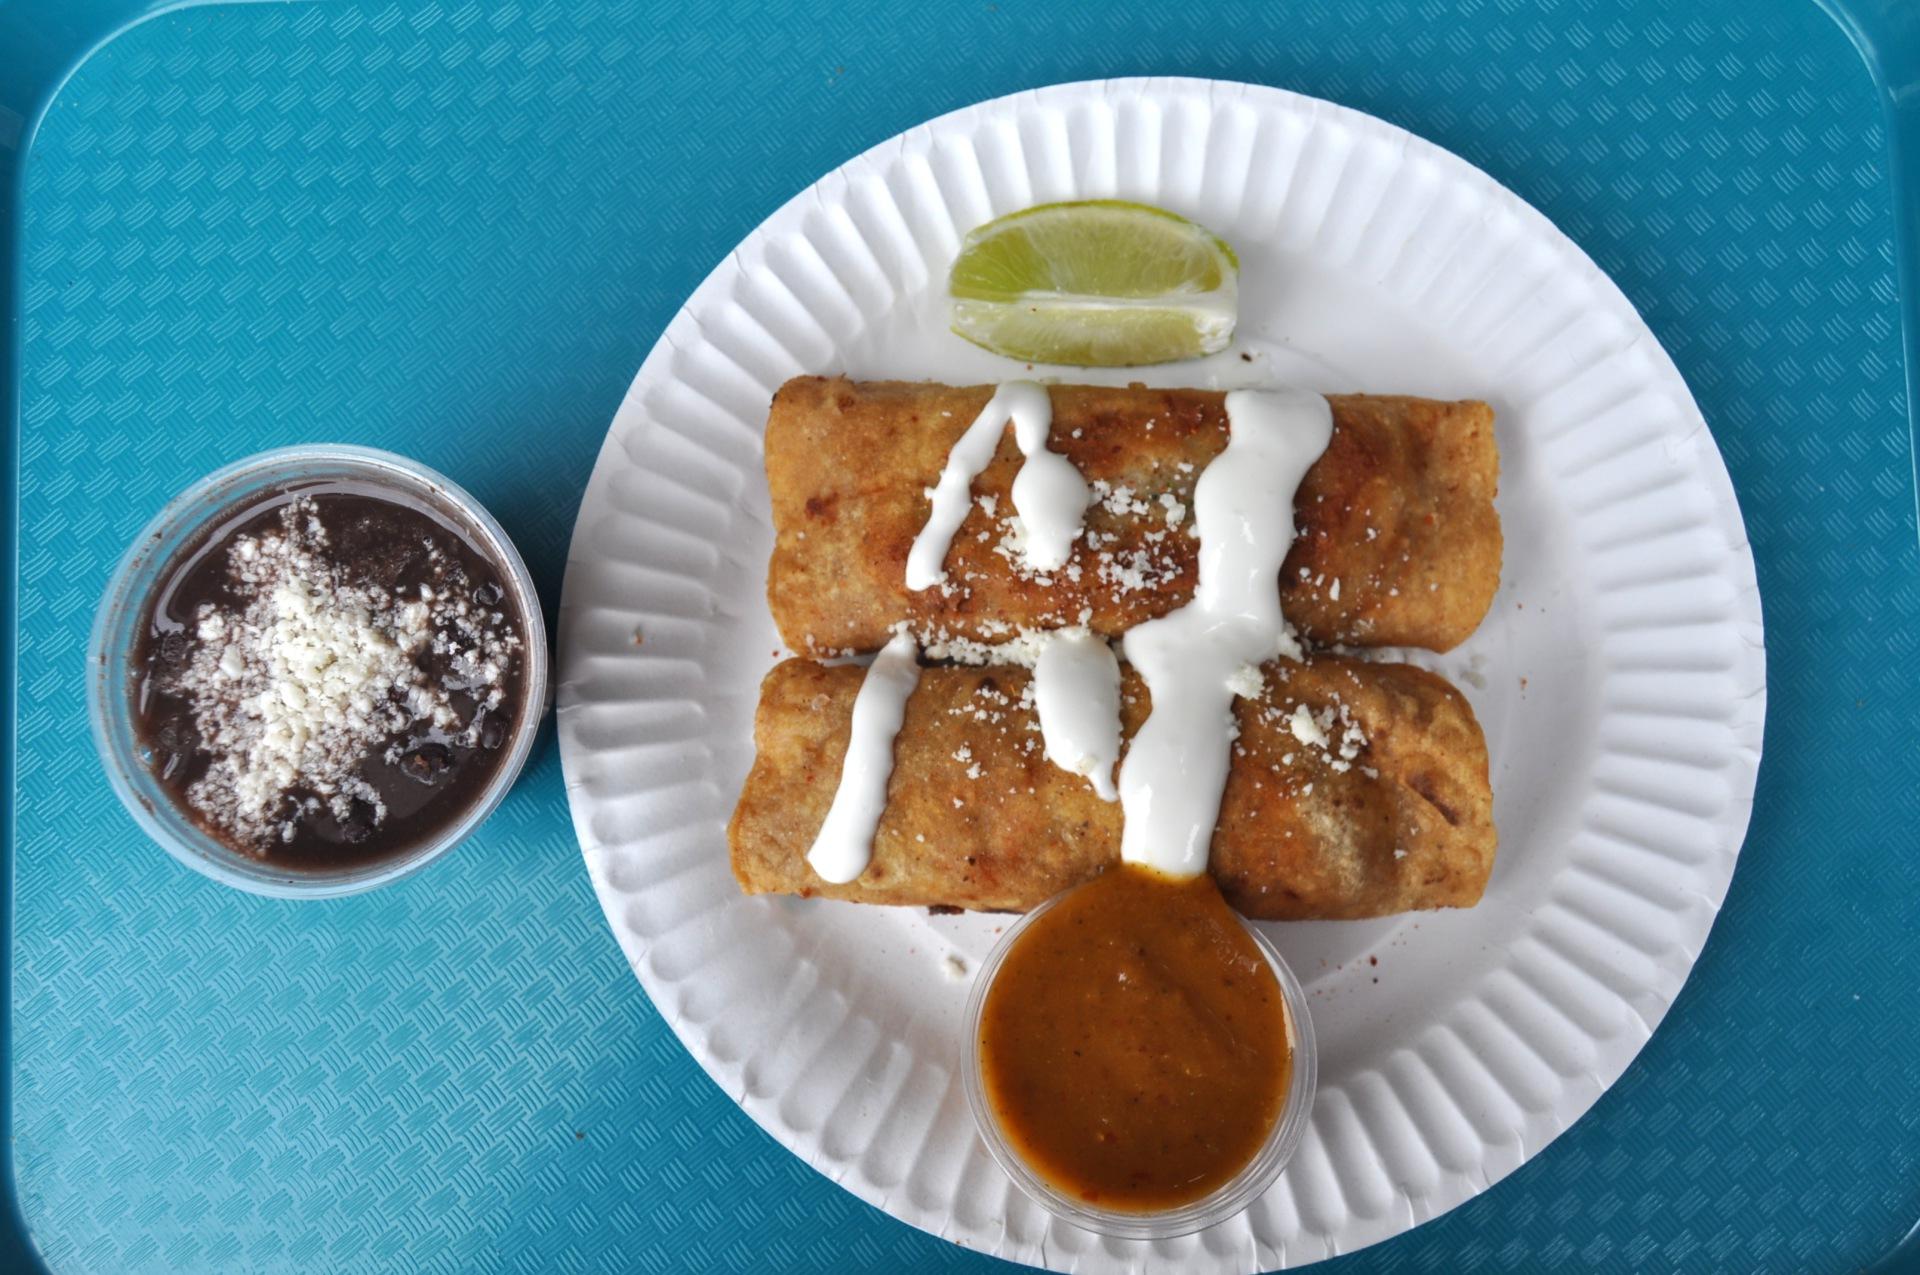 Vegetarian Fried Taquitos